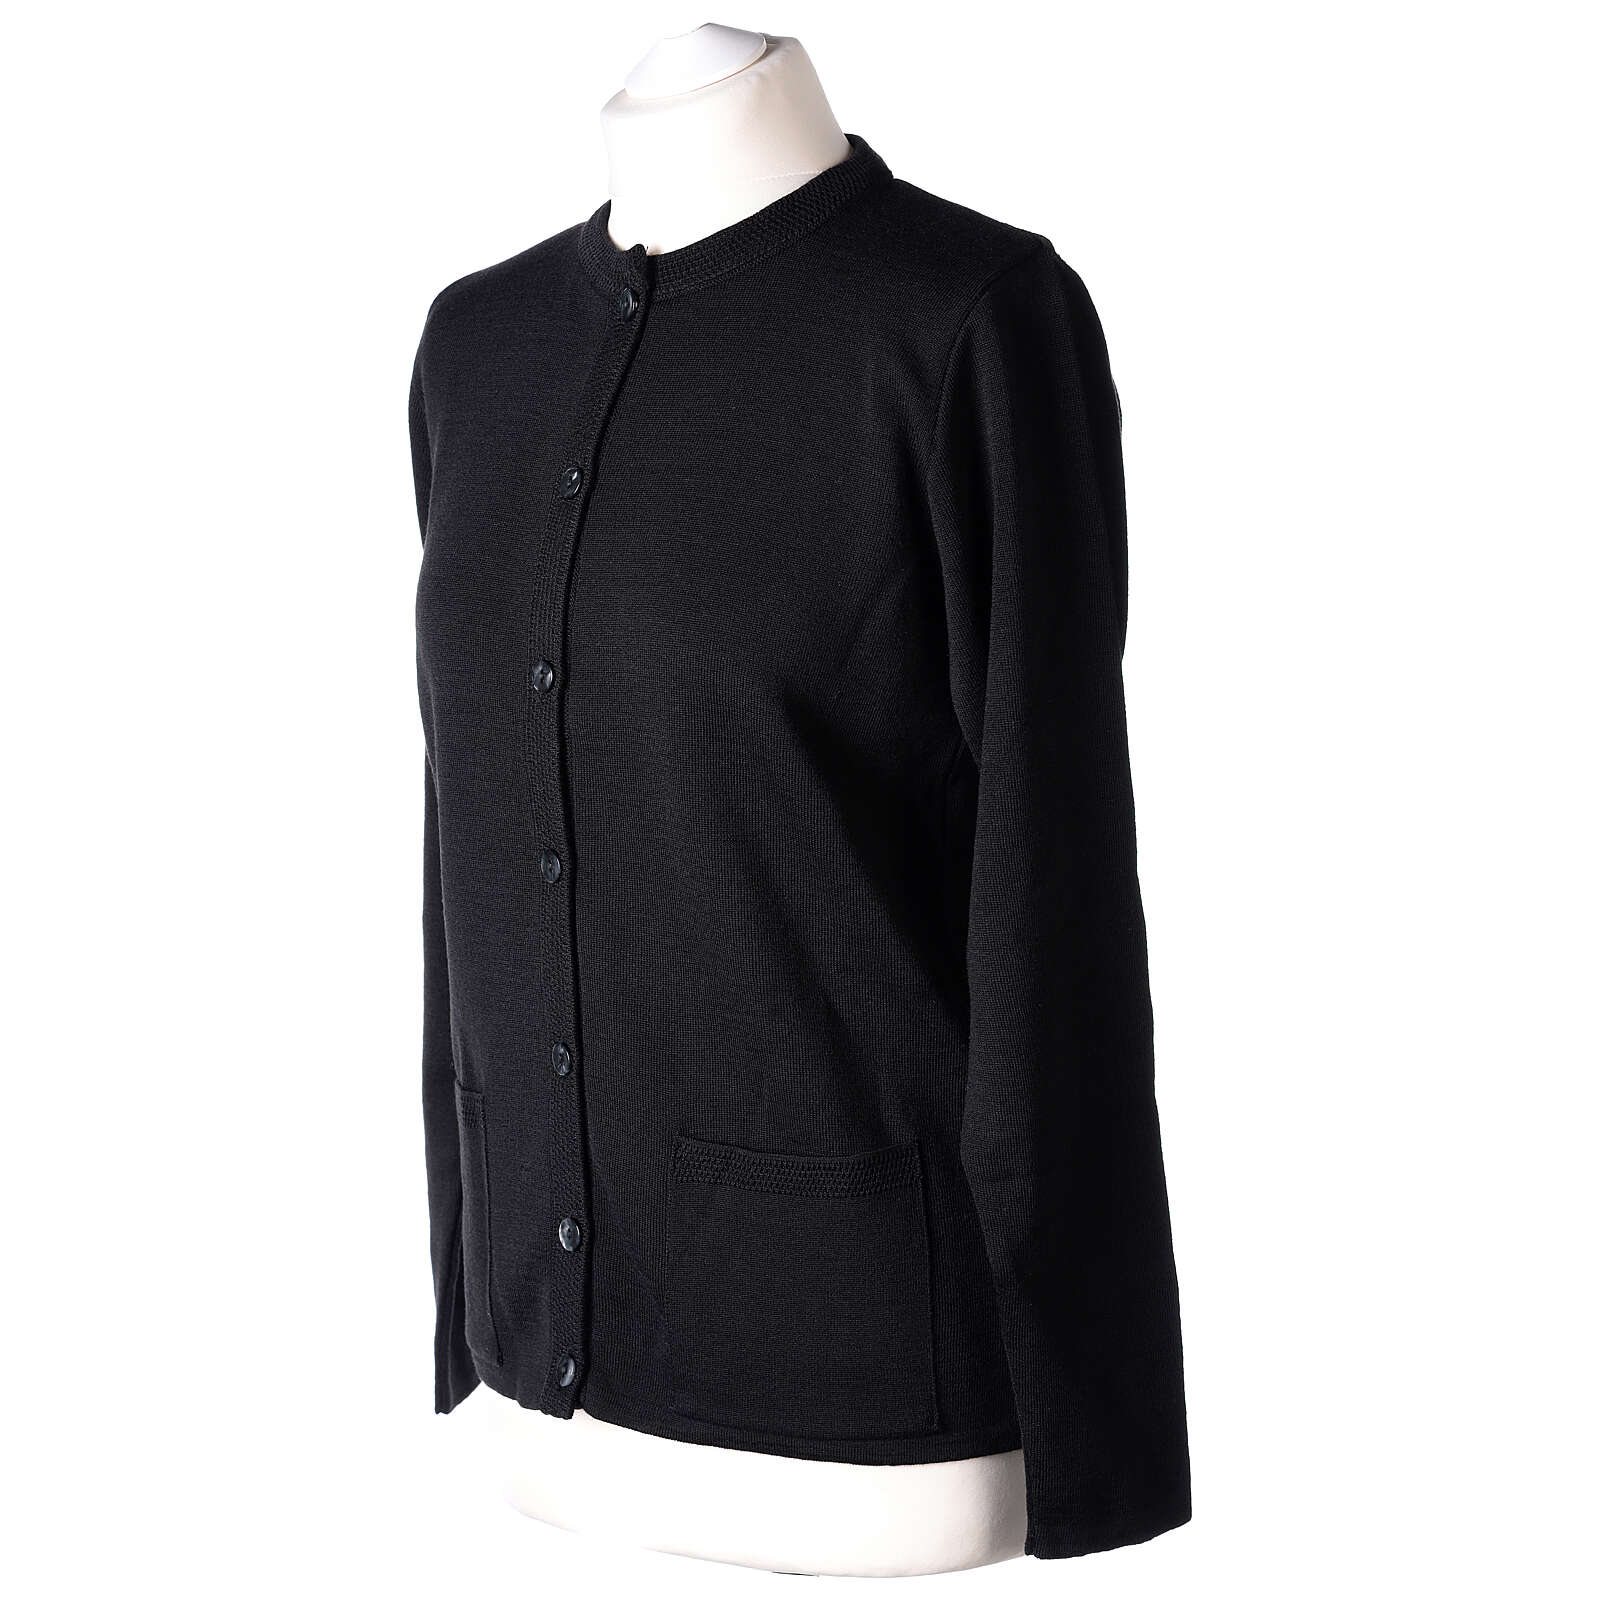 Rebeca monja negra coreana bolsillos punto unido 50% acrílico 50% lana merina In Primis 4